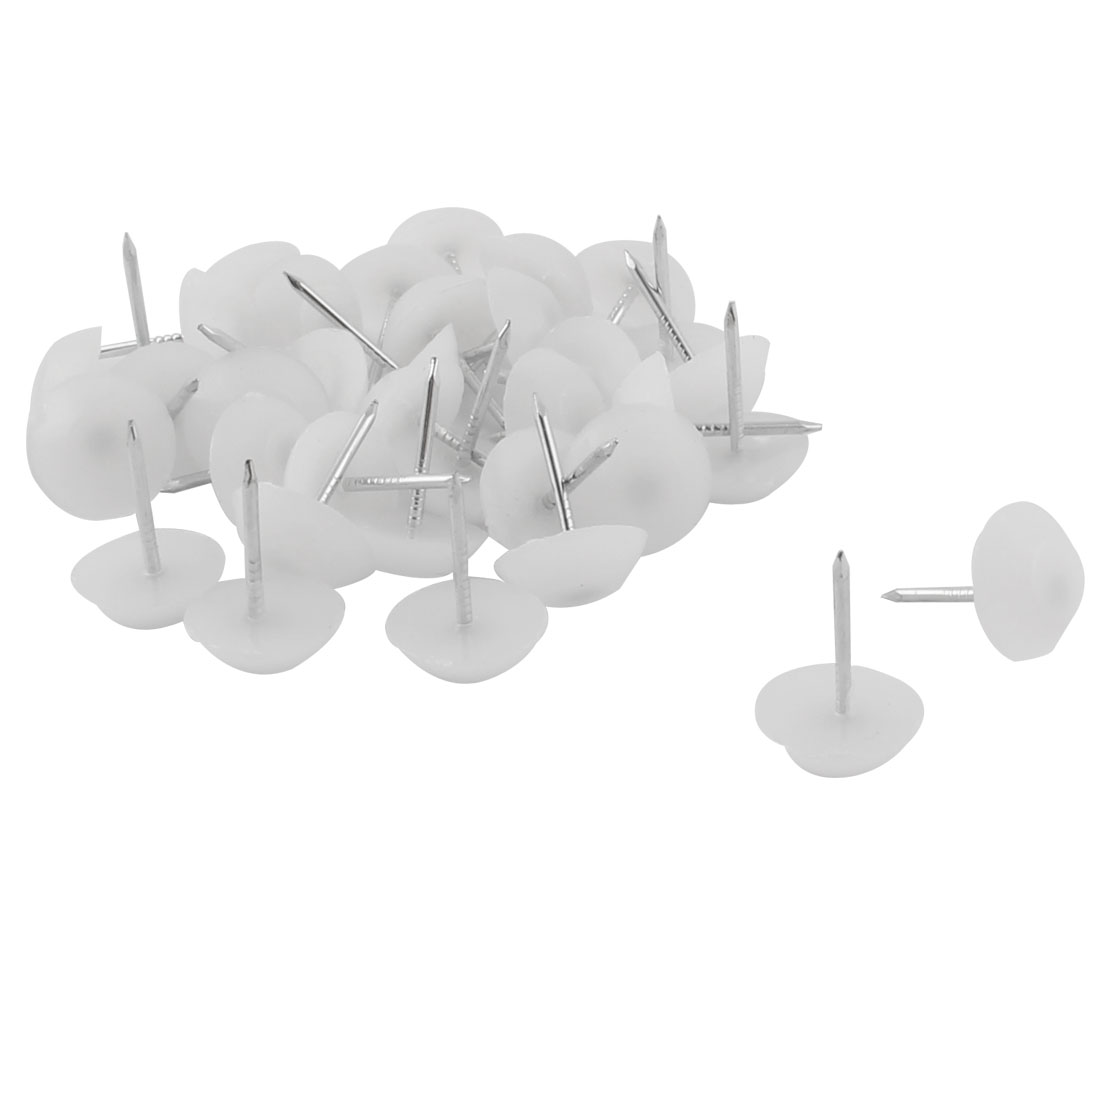 Furniture Chair Plastic Leg Feet Protector Non-slip Nails White 1.2cm Dia 30pcs